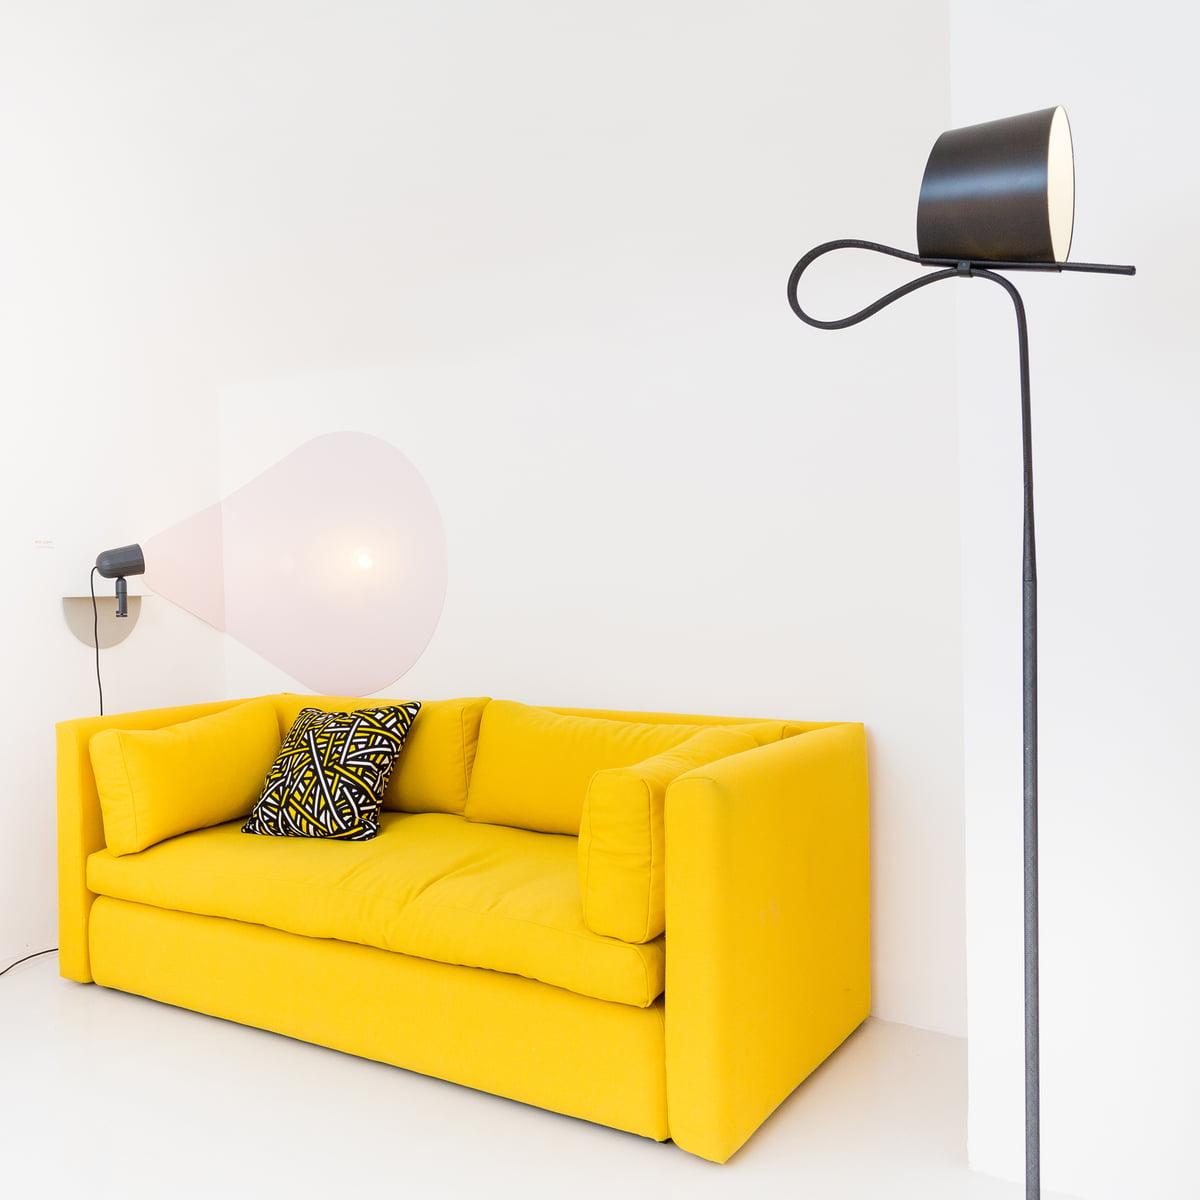 the hay hackney sofa. Black Bedroom Furniture Sets. Home Design Ideas